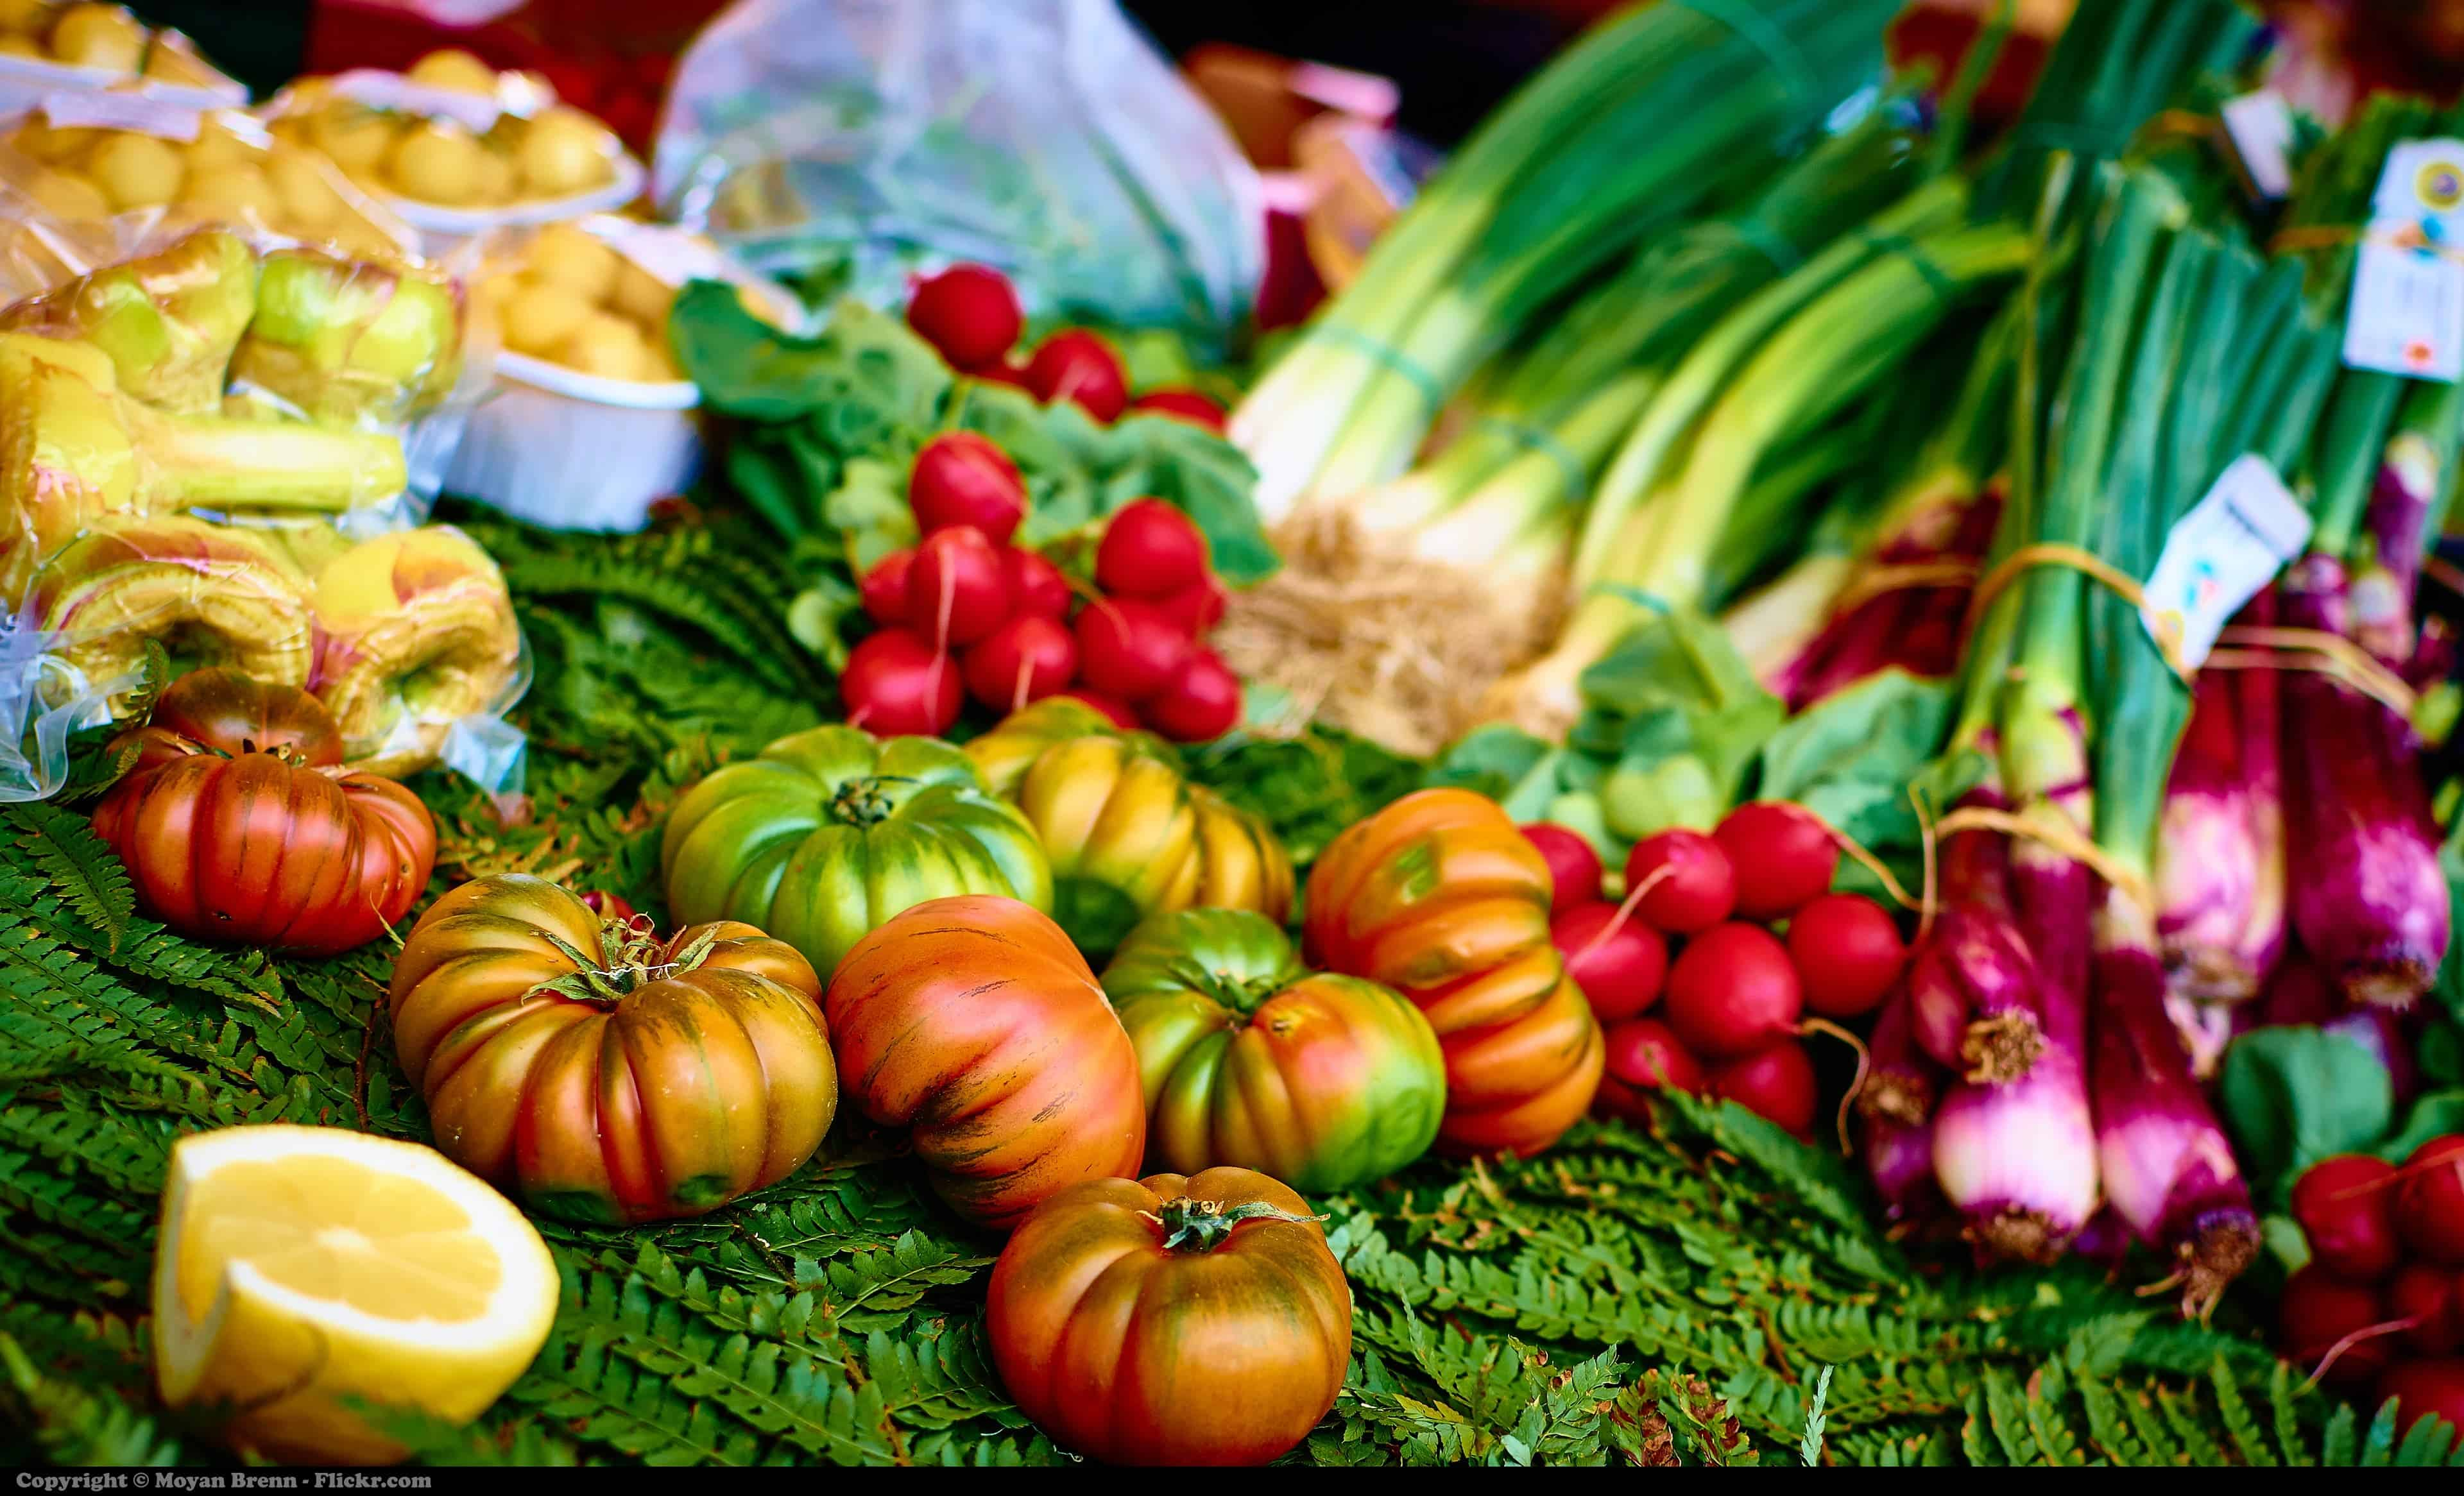 Whole Foods Depression Medicine